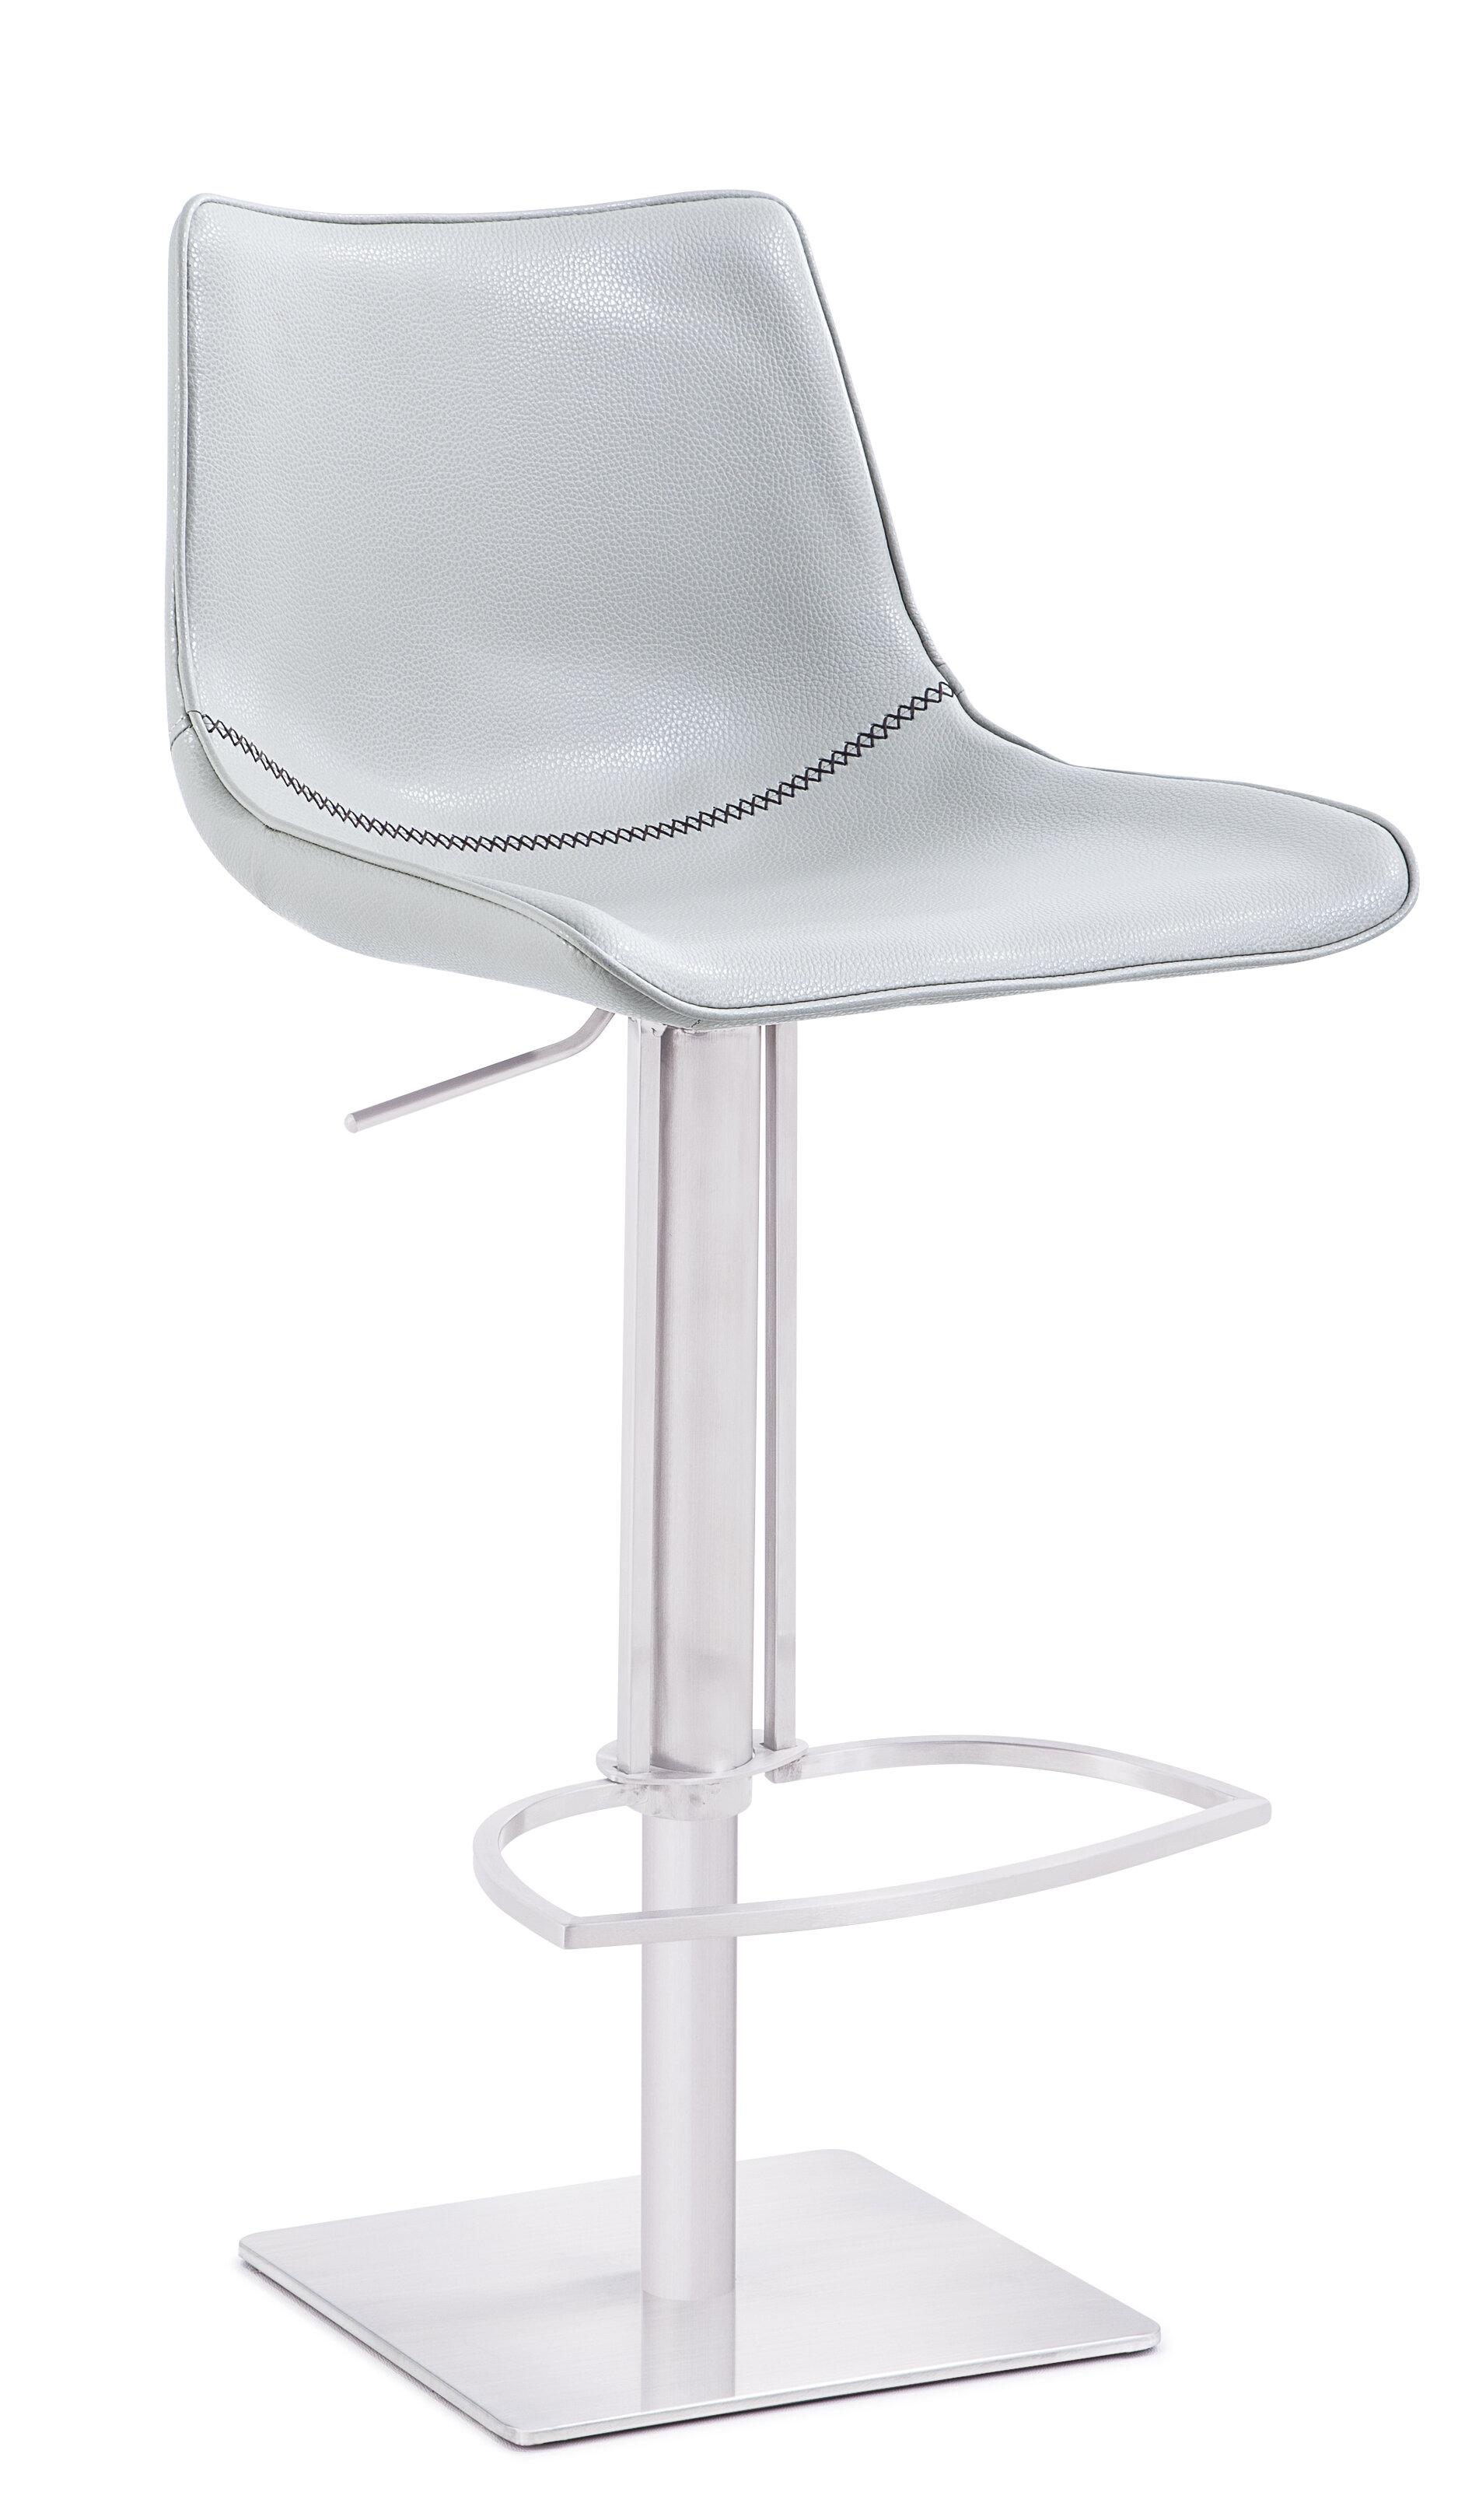 Image of: Orren Ellis Sahara Modern Adjustable Height Swivel Bar Stool Wayfair